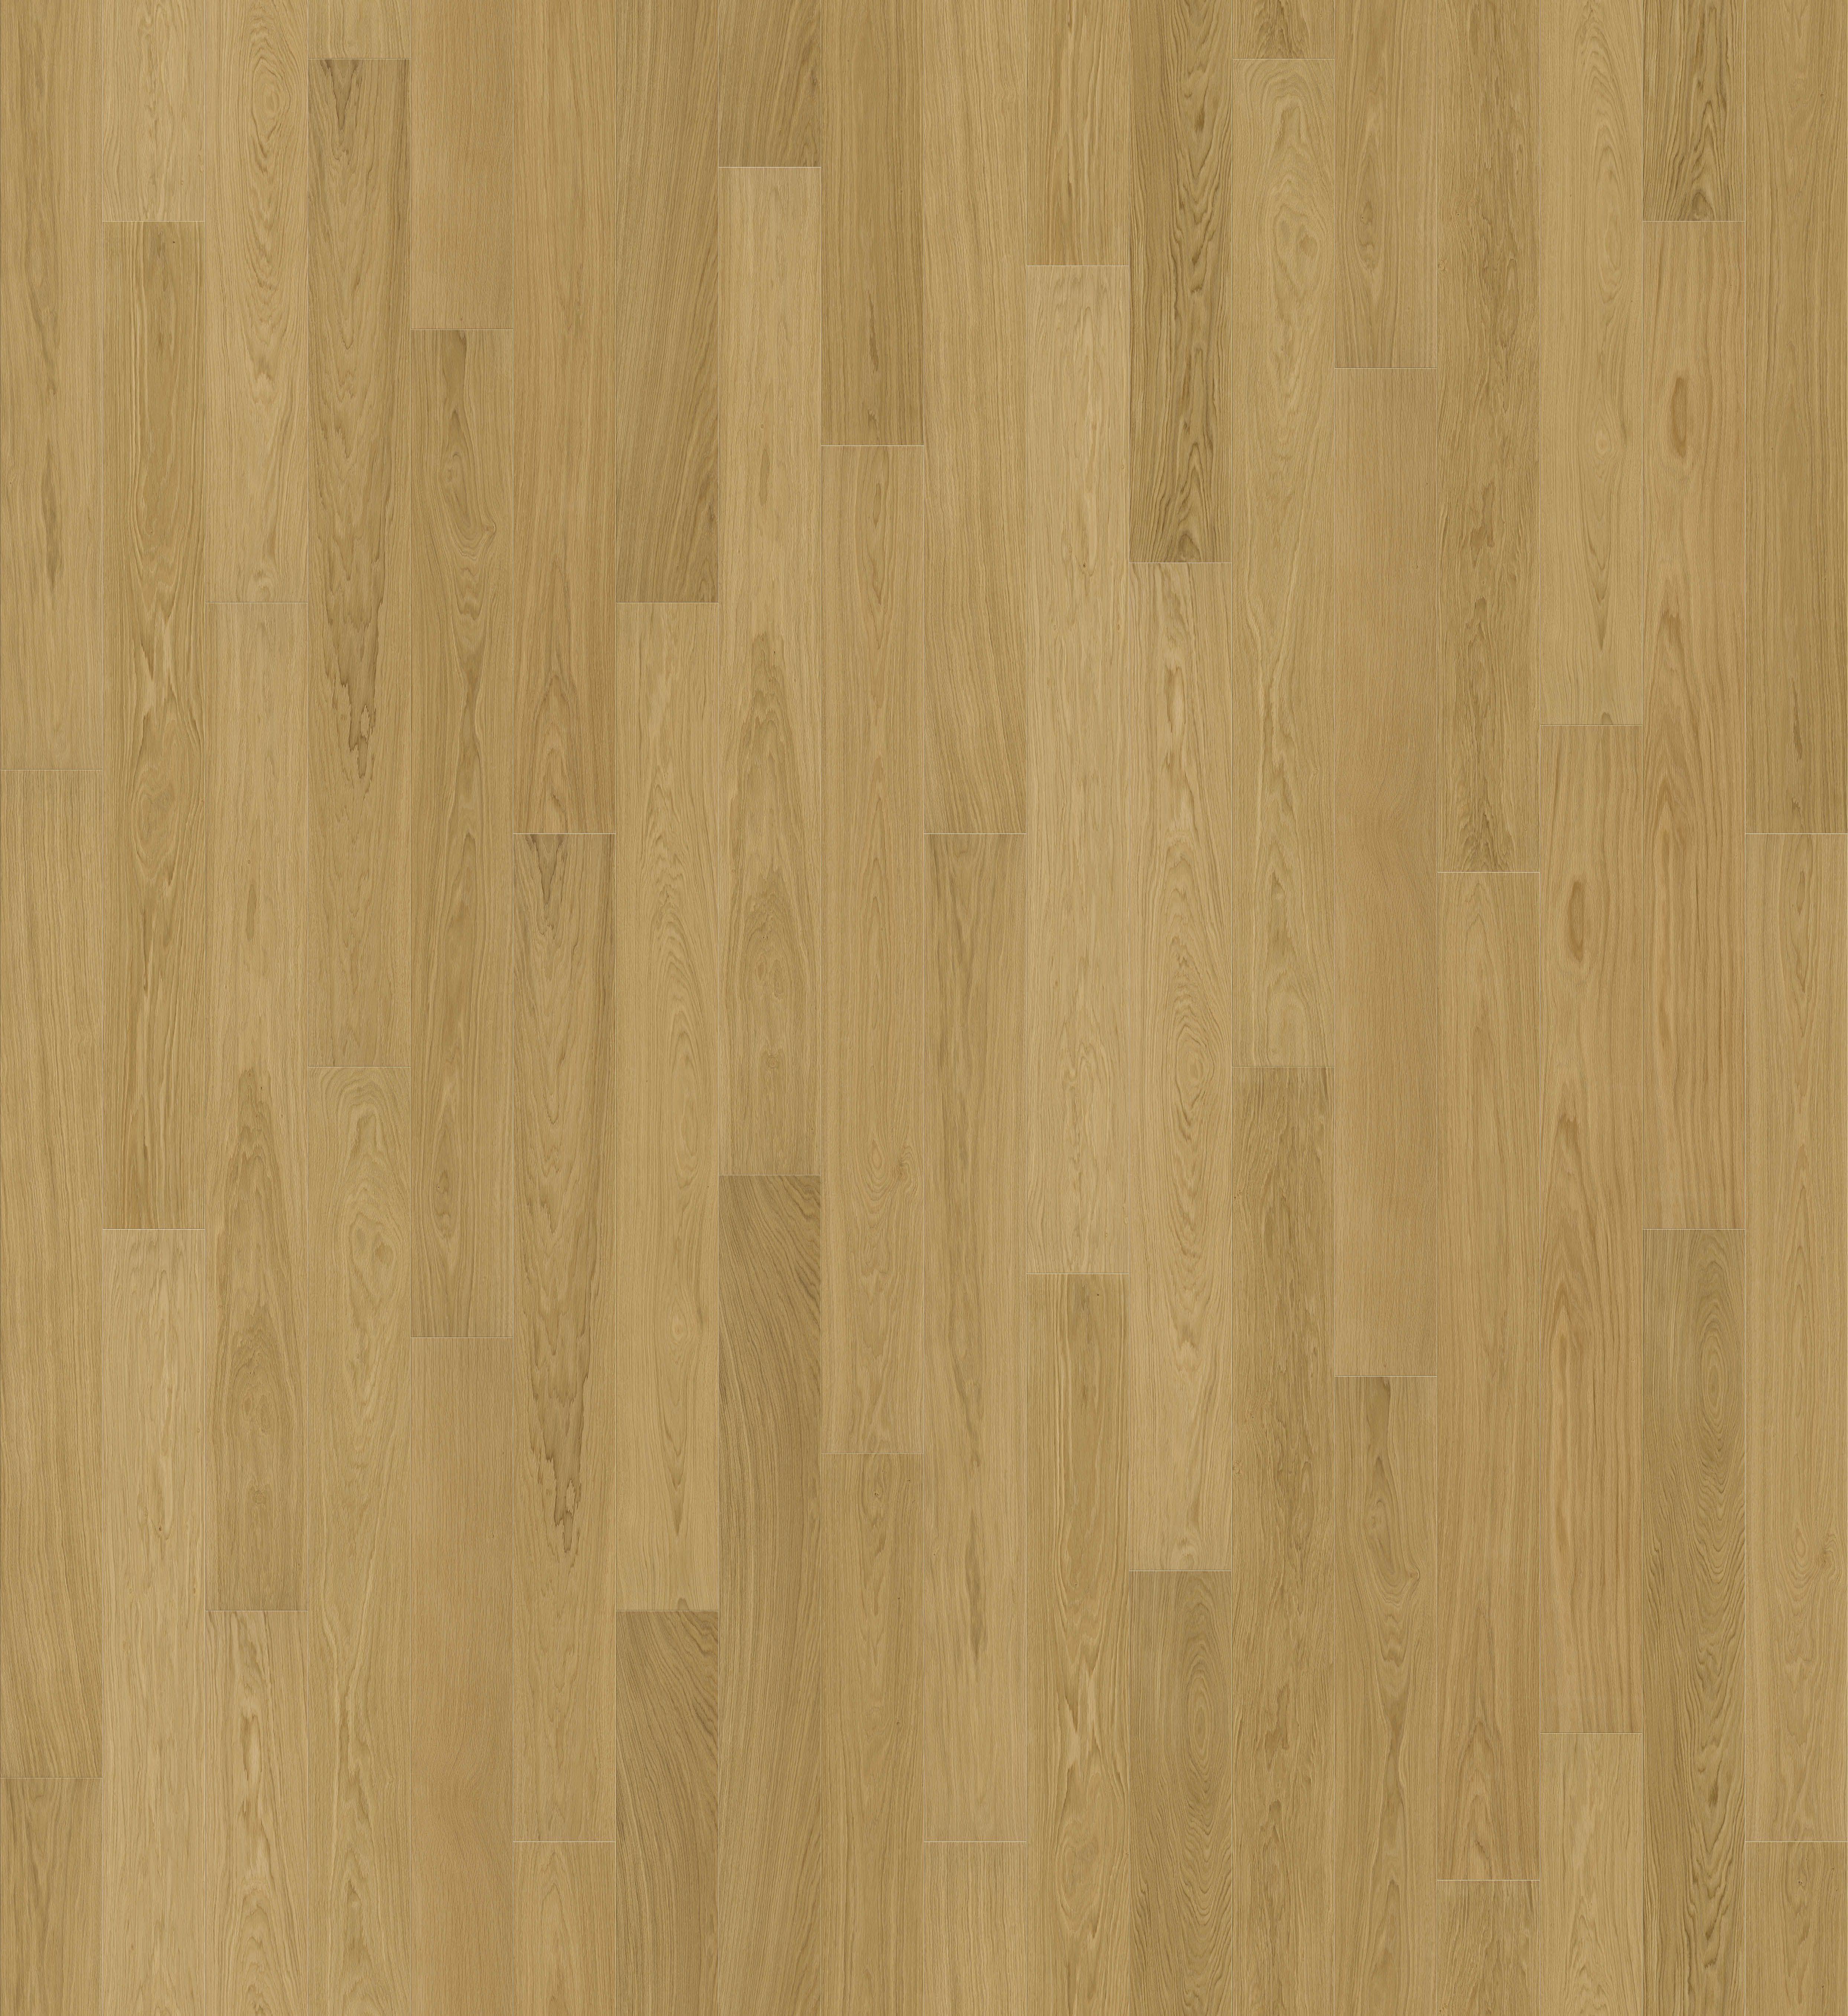 floor patterns ideas photos wood tierra este calculator pattern wooden spectacular